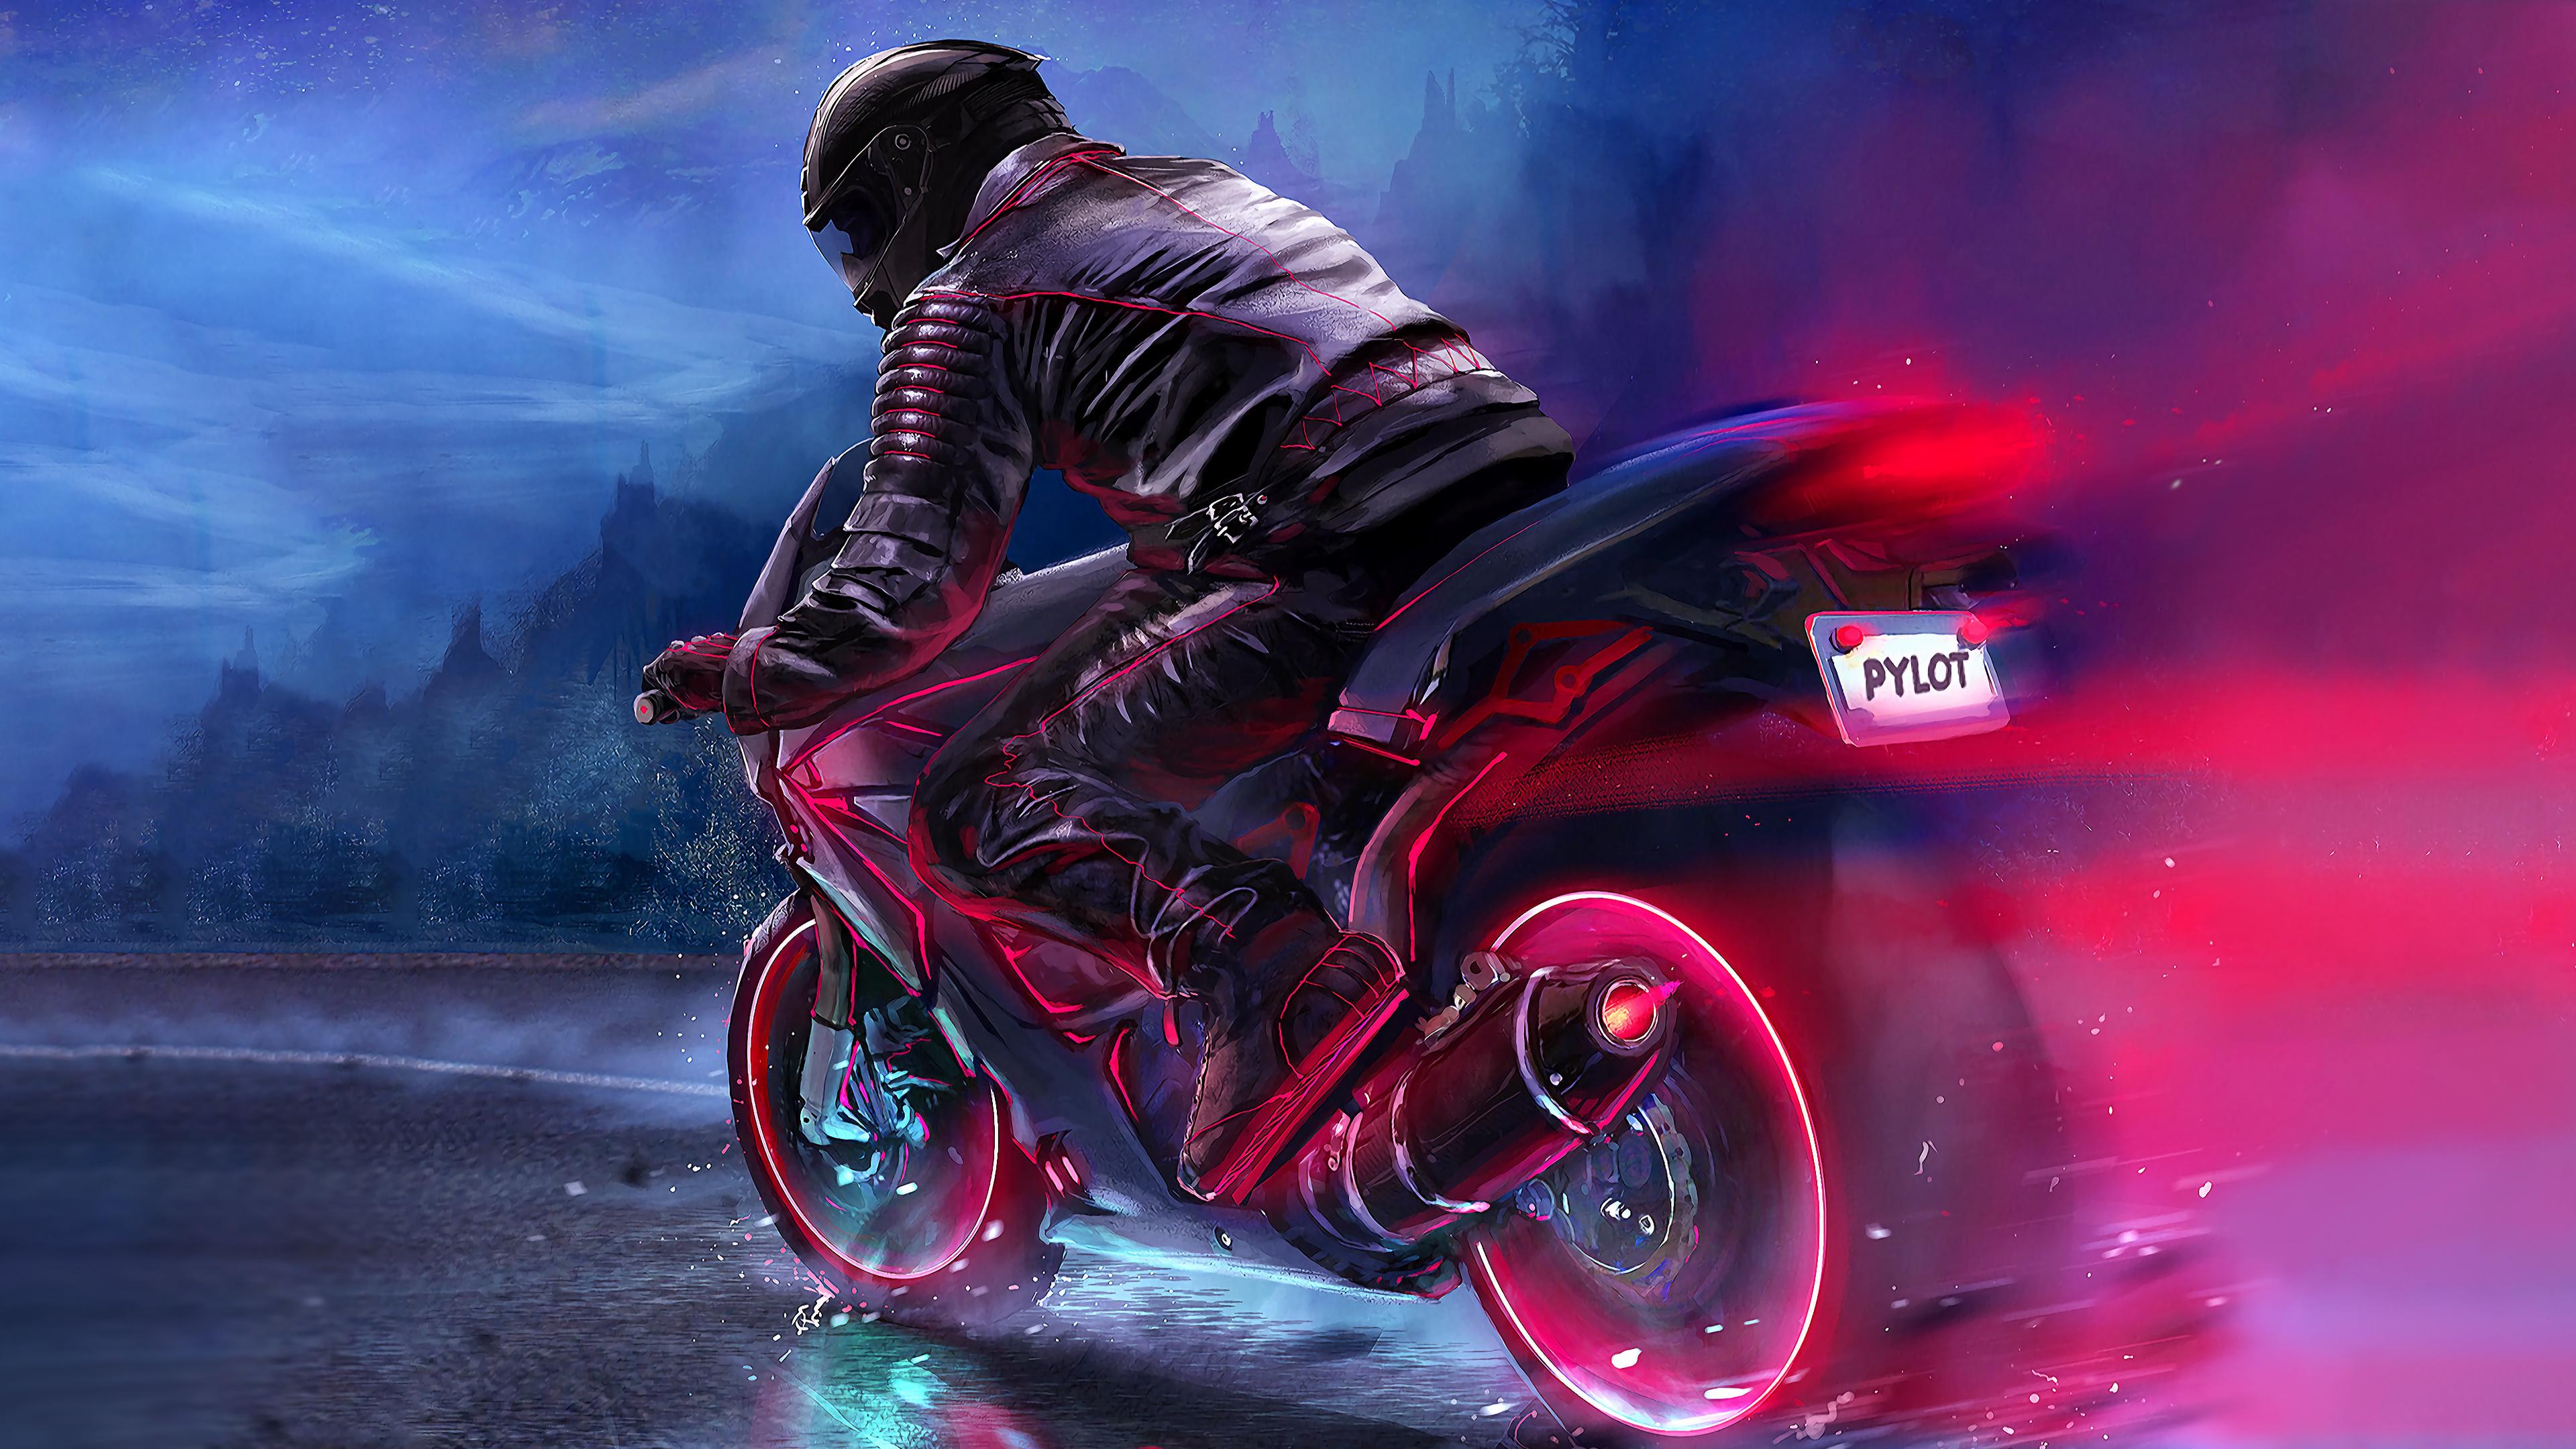 retro bike rider 4k 1540755694 - Retro Bike Rider 4k - retrowave wallpapers, retro wallpapers, hd-wallpapers, digital art wallpapers, biker wallpapers, bike wallpapers, artwork wallpapers, artist wallpapers, 4k-wallpapers